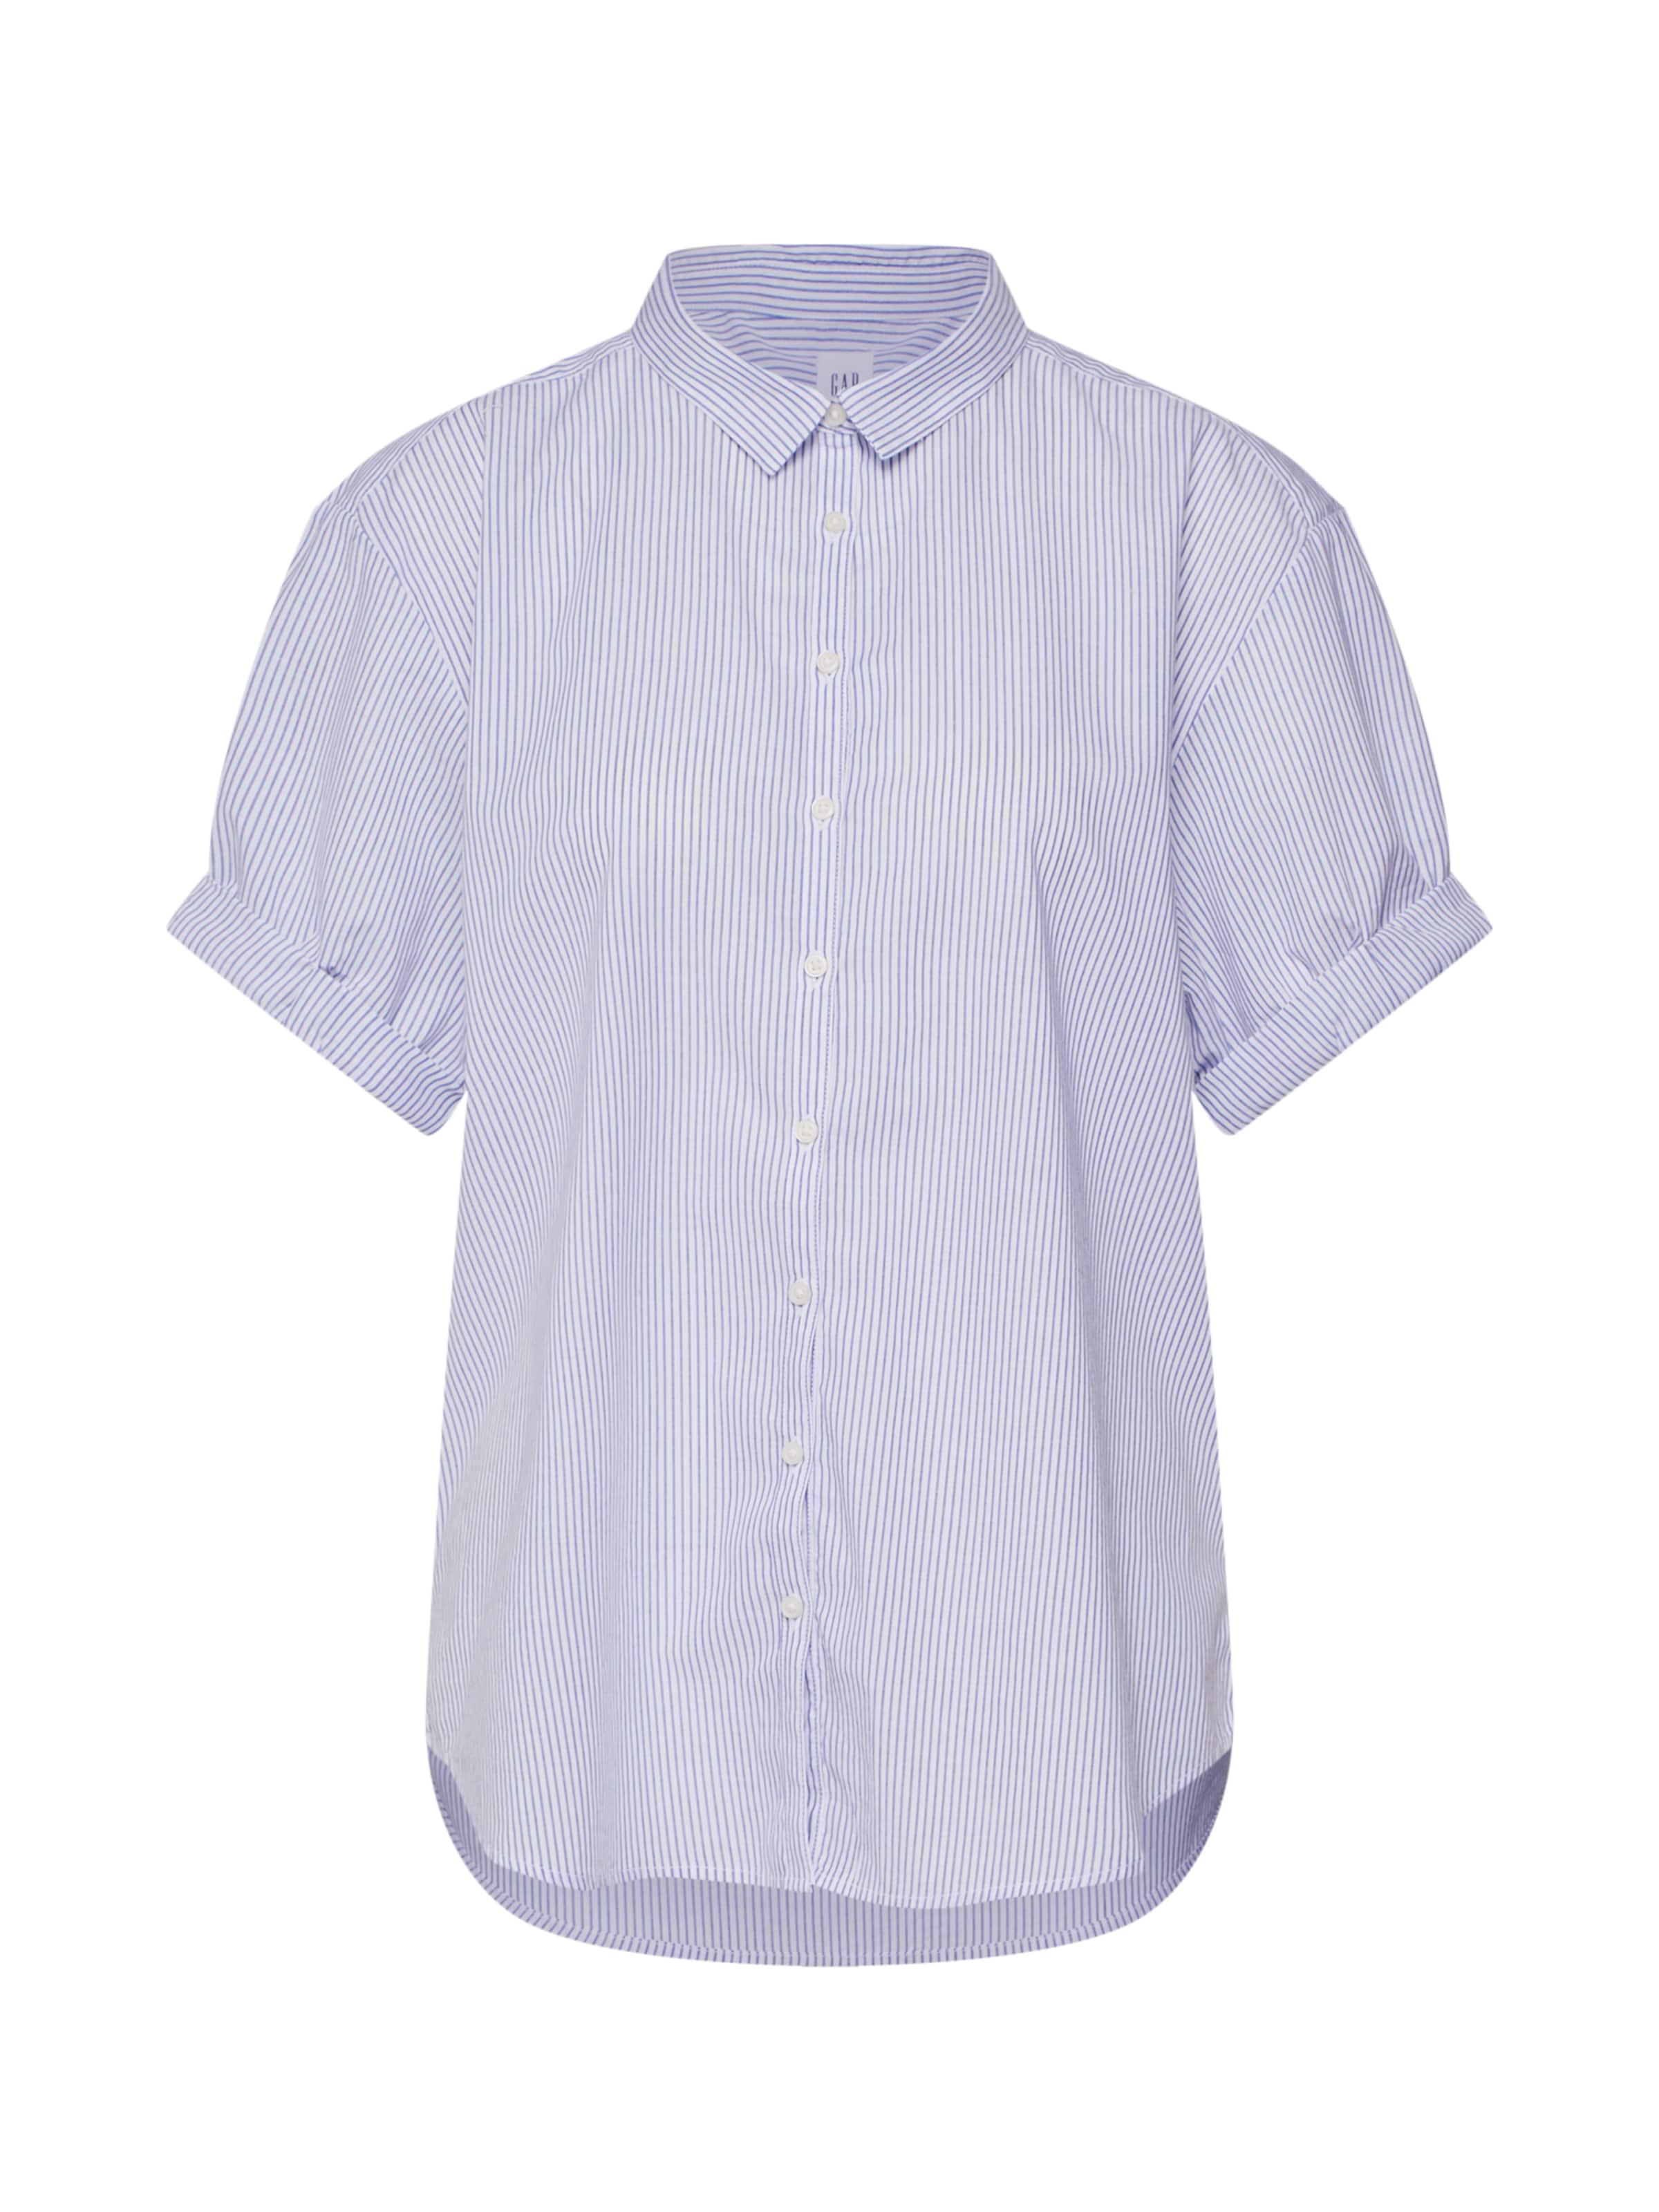 En Gap Shirt' Cuff ClairBlanc 'ss Bleu Chemisier Roll J3uKlcFT1